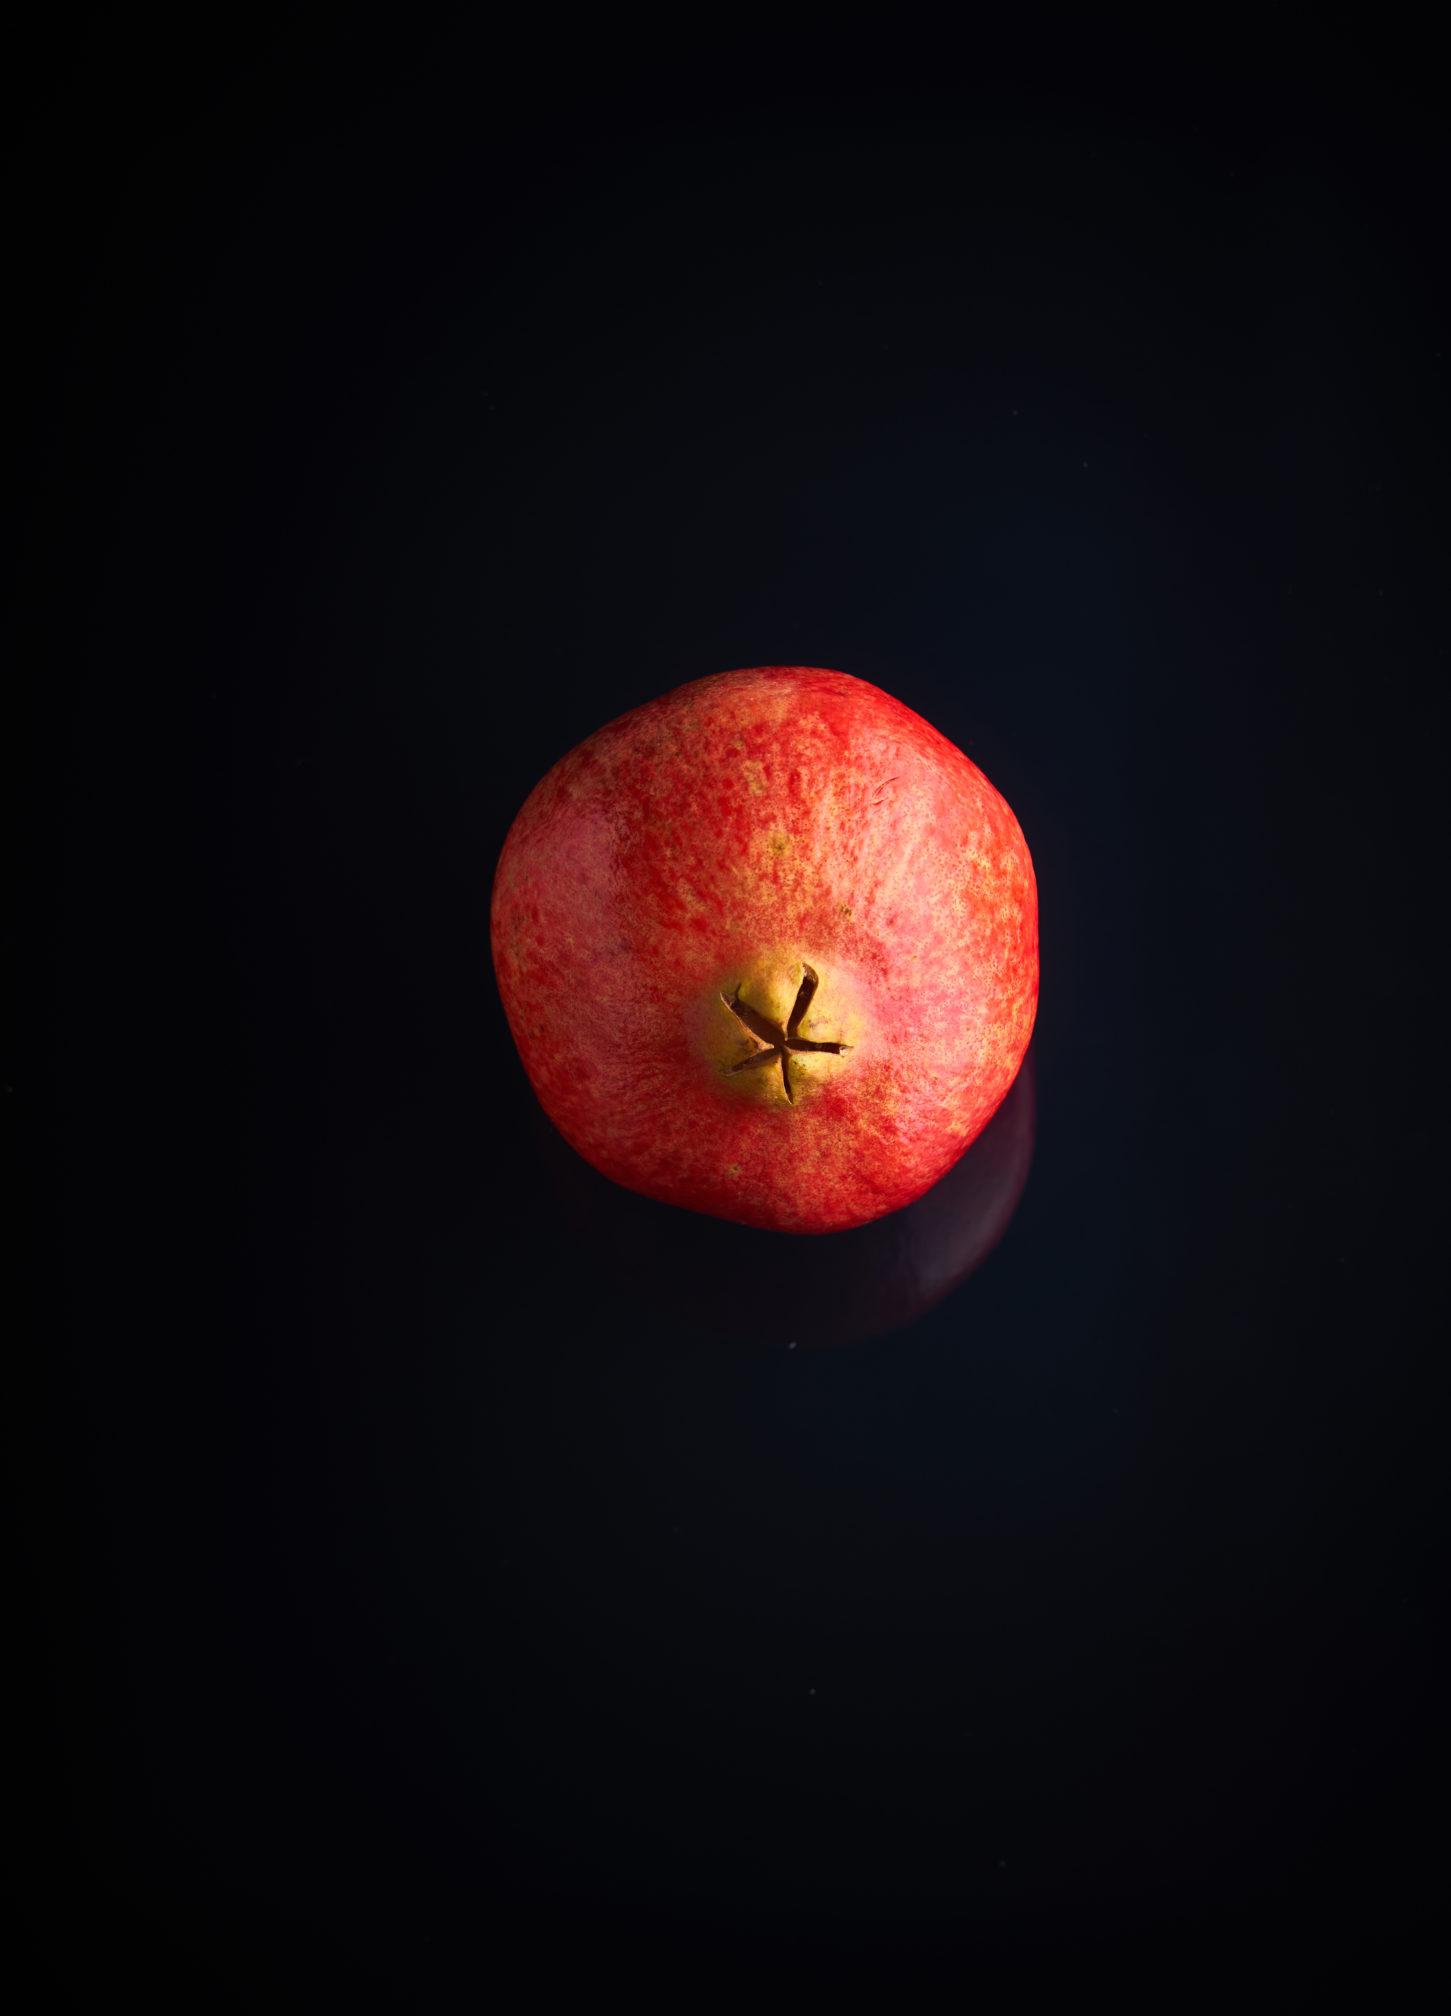 capexo-lilot-fruits-exotique-grenade-israel-perou-portugal-espagne-turquie